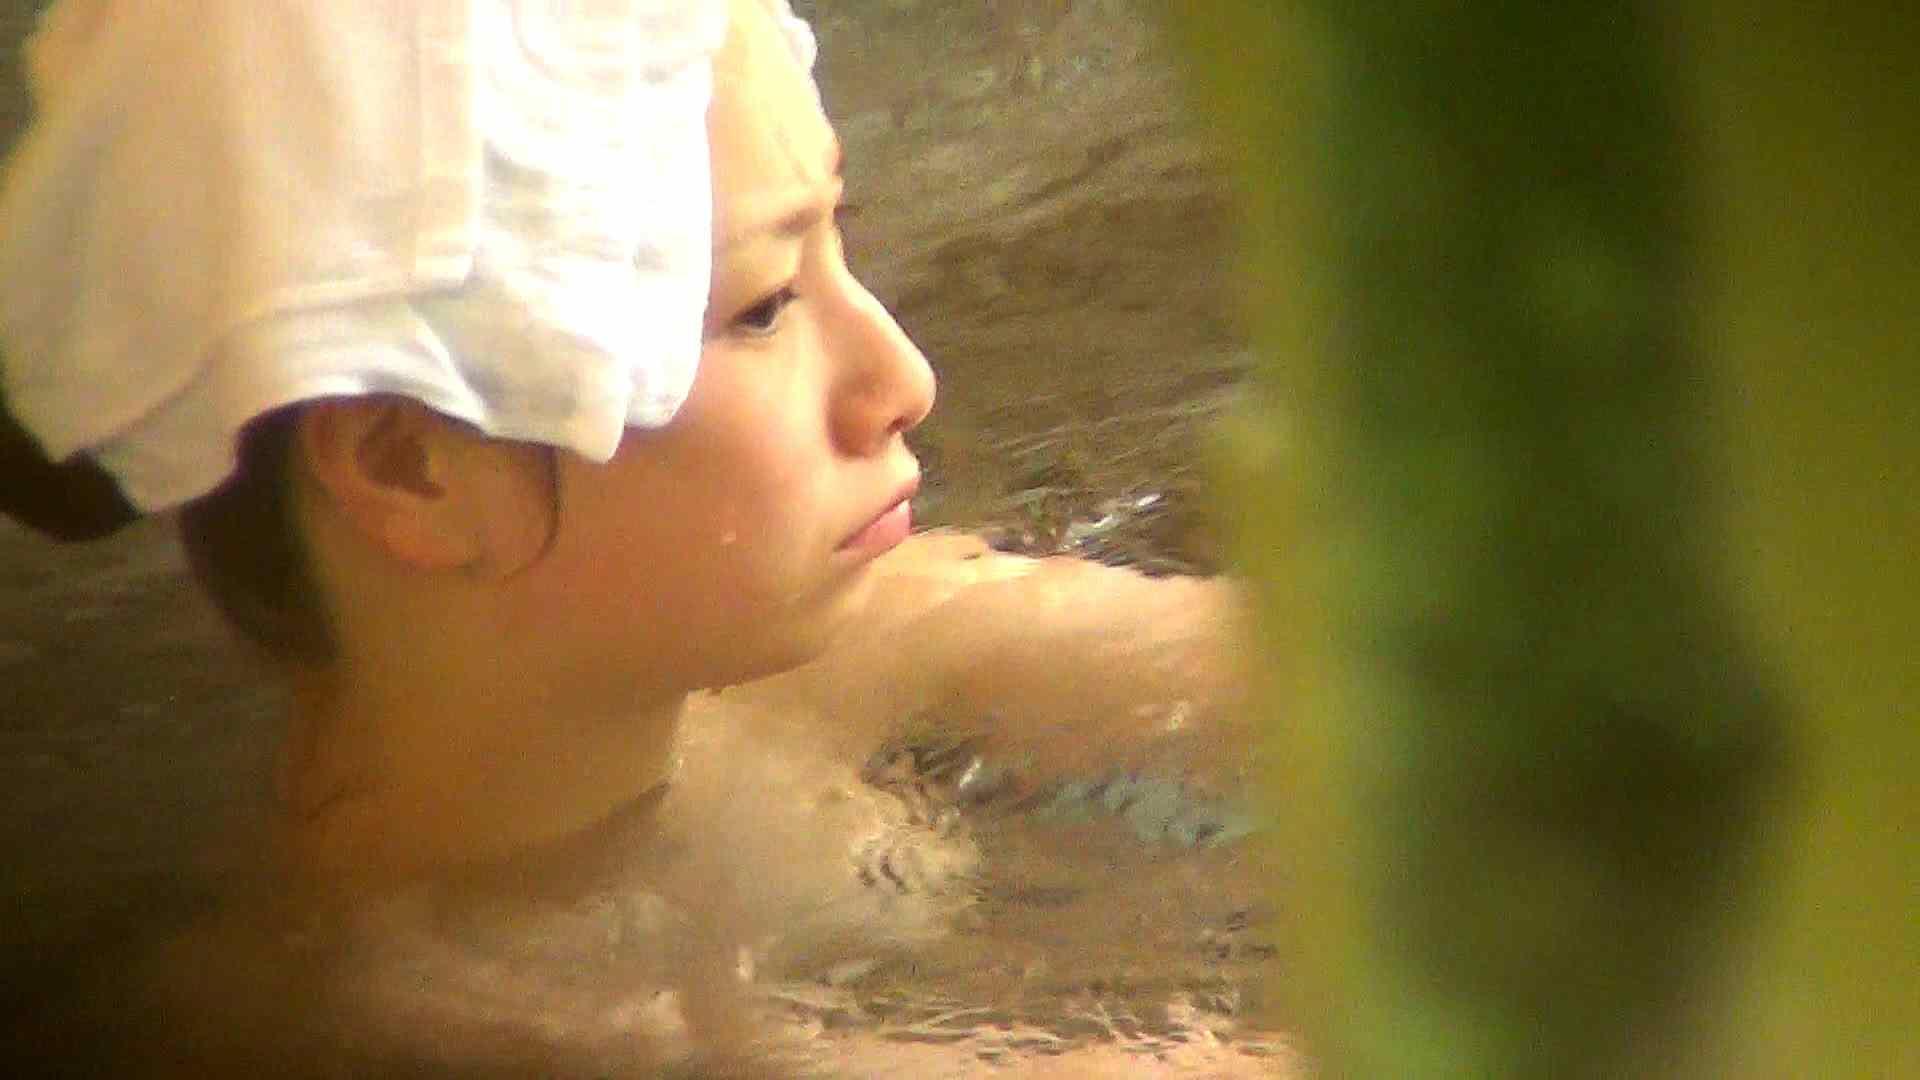 Aquaな露天風呂Vol.266 盗撮映像  83Pix 56